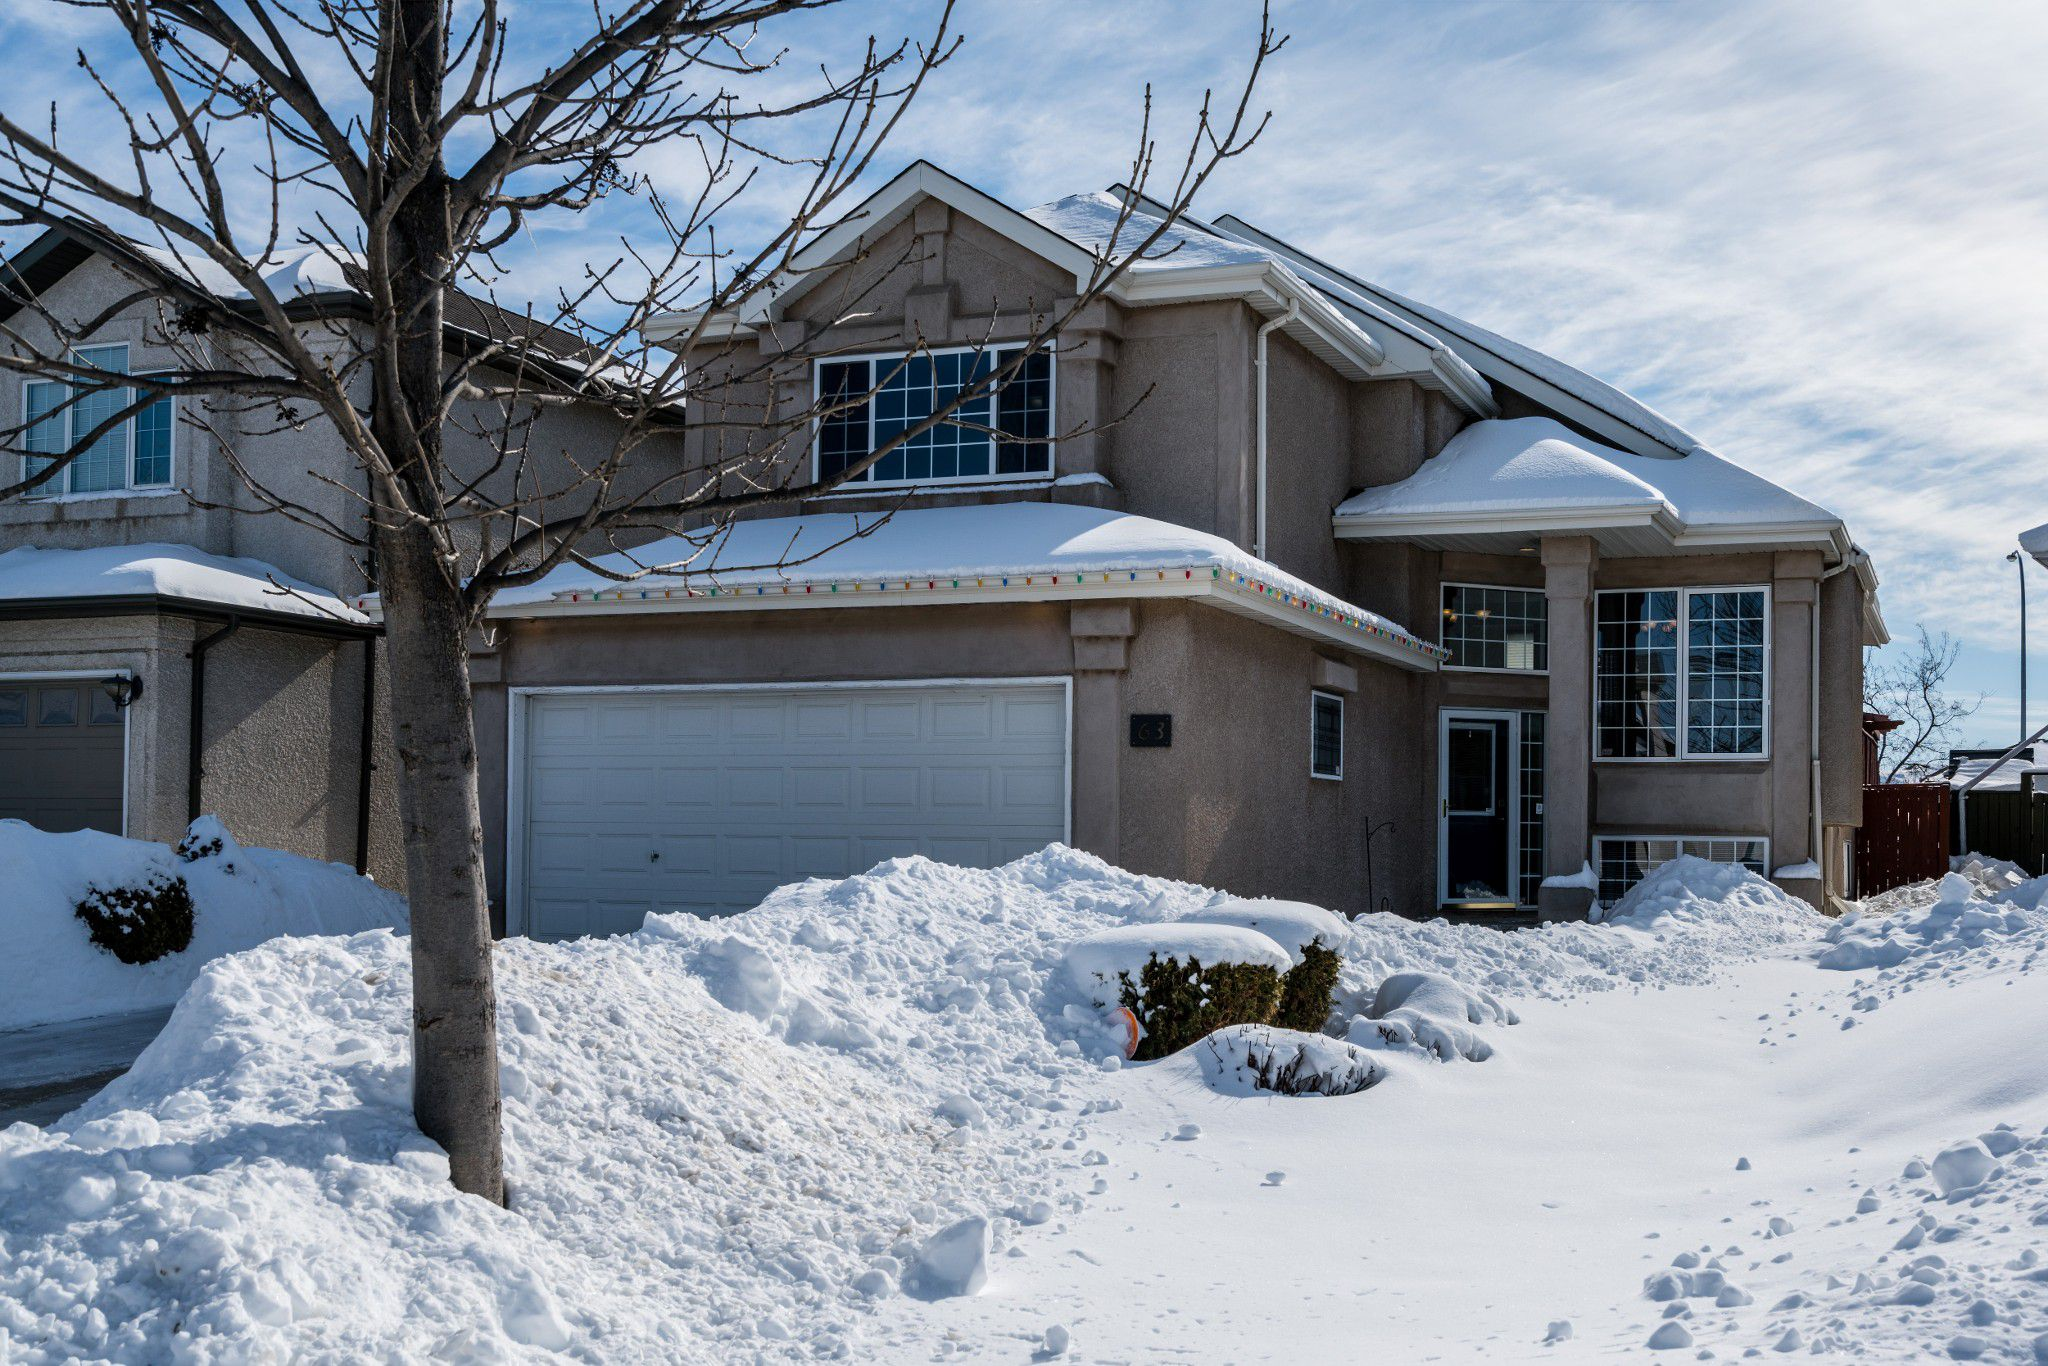 Main Photo: 63 Arpin Bay in Winnipeg: Island Lakes Residential for sale (2J)  : MLS®# 1805172